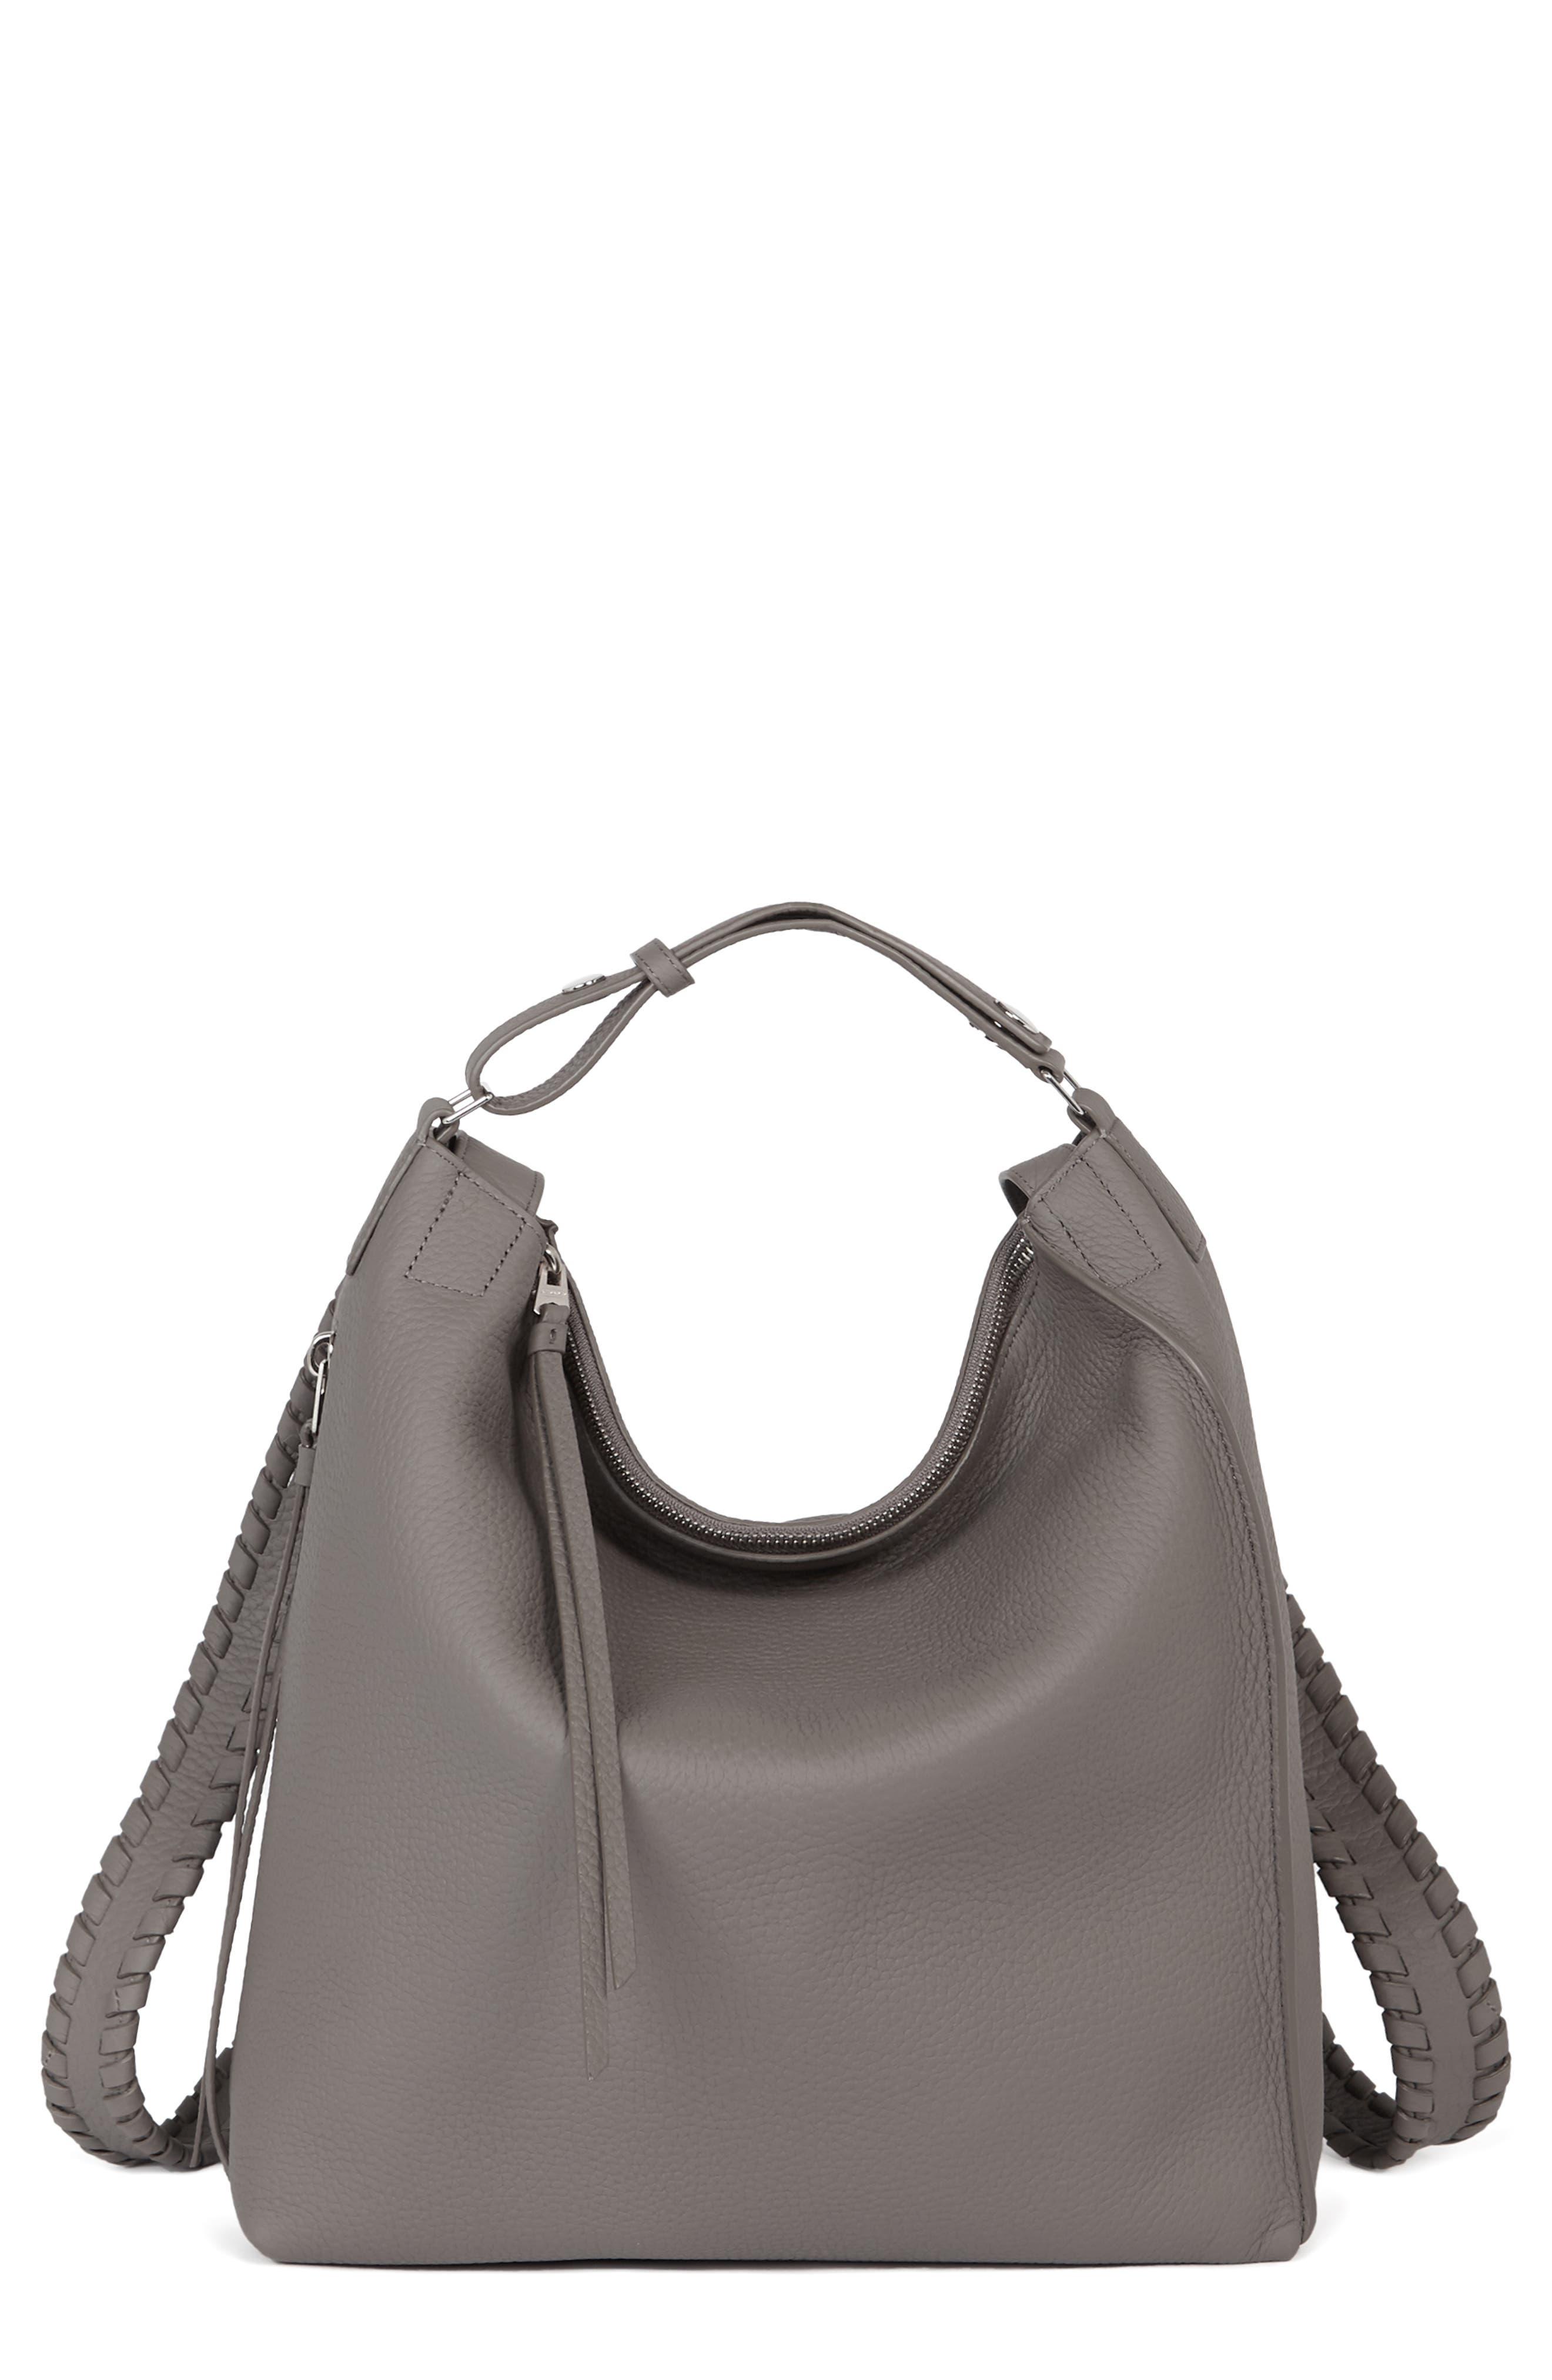 d870fb34611 backpack purse   Nordstrom